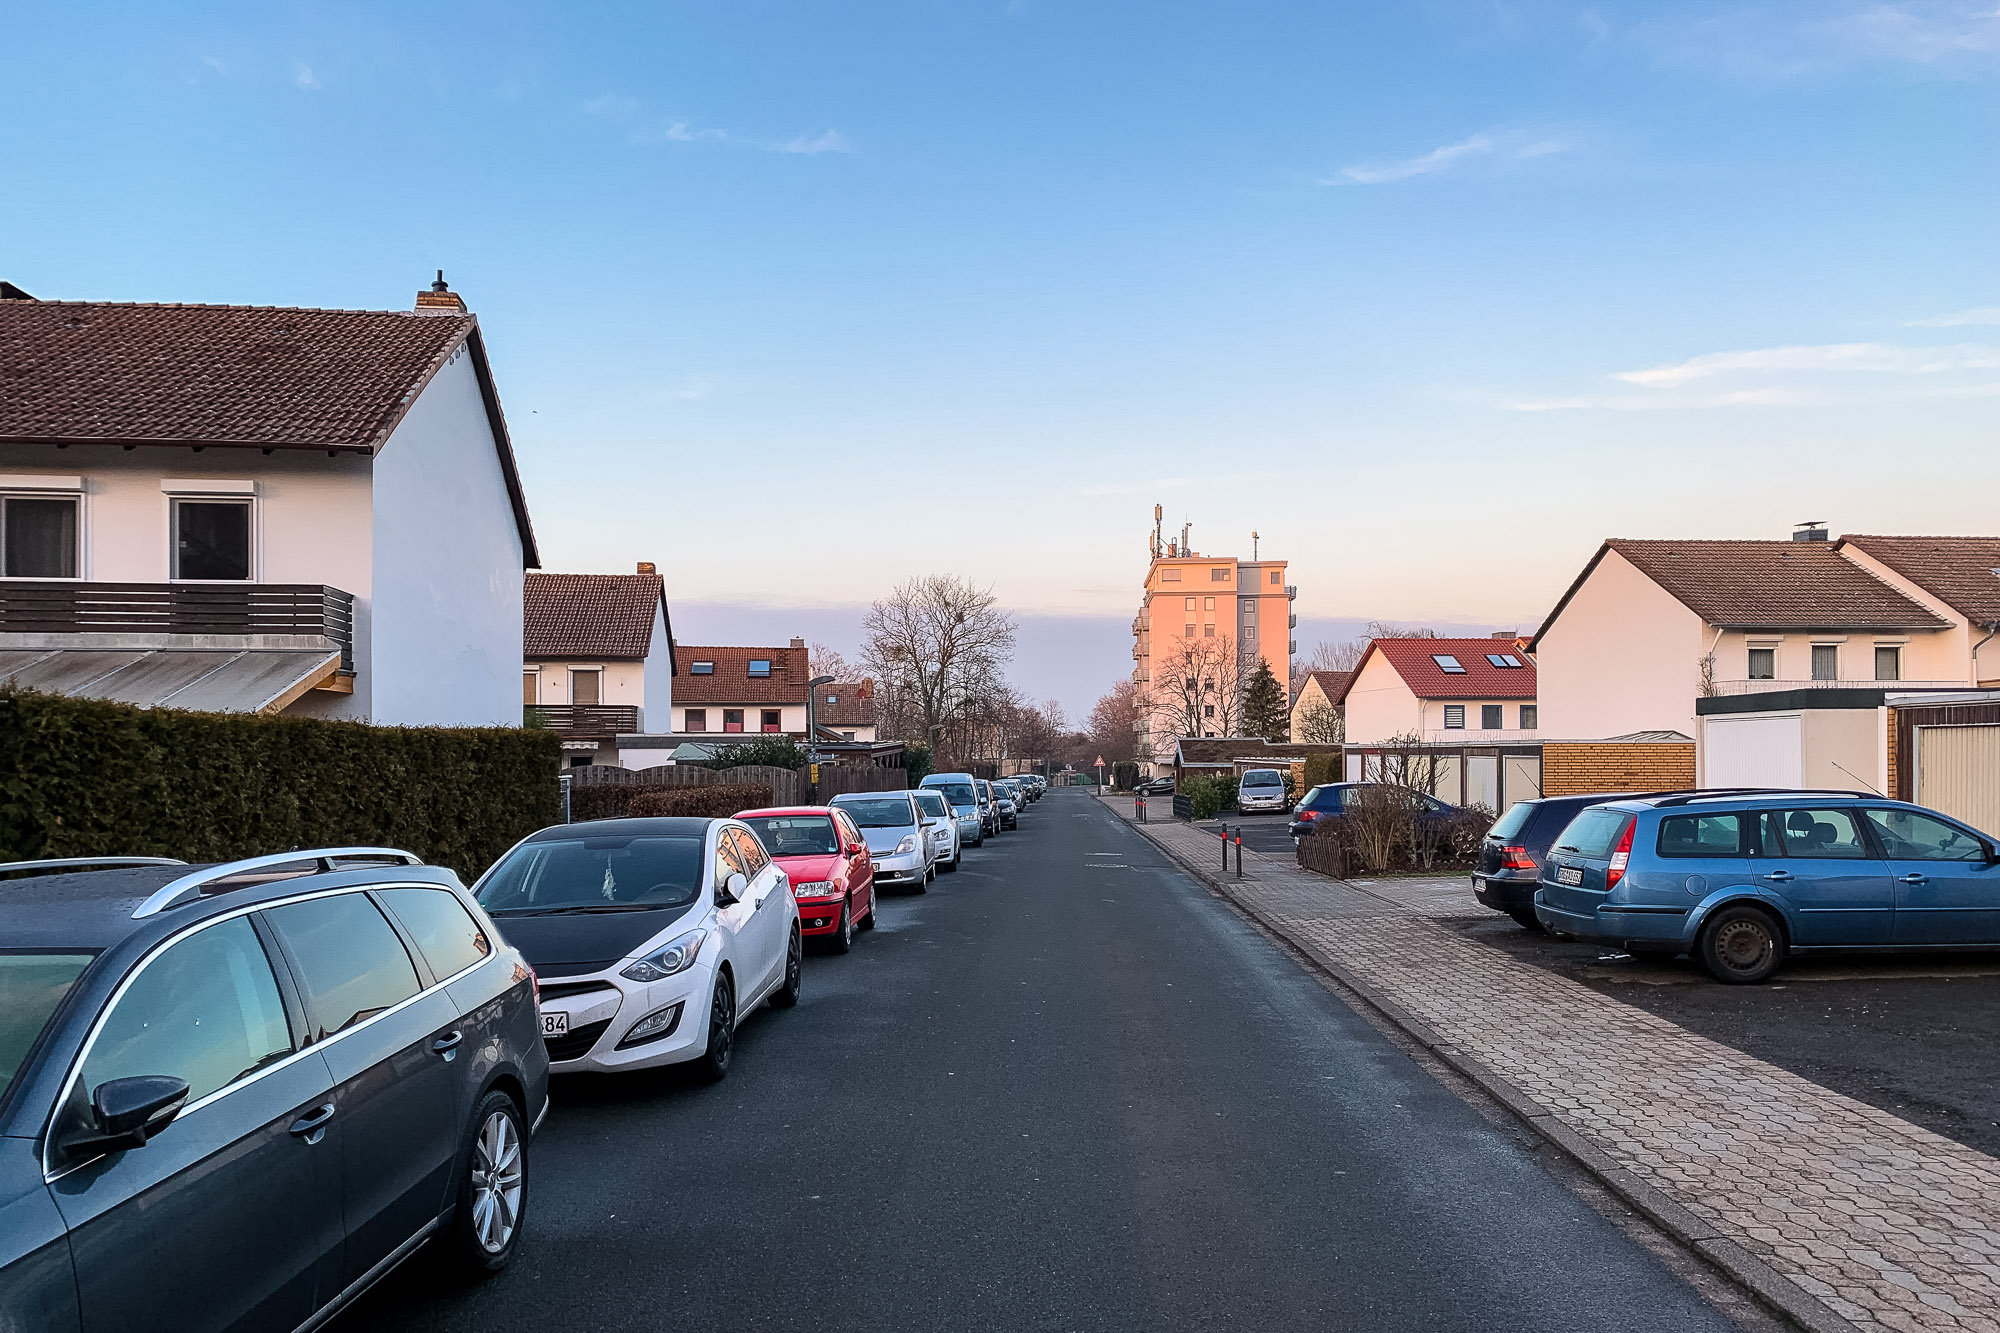 Bad Nenndorf high-rise